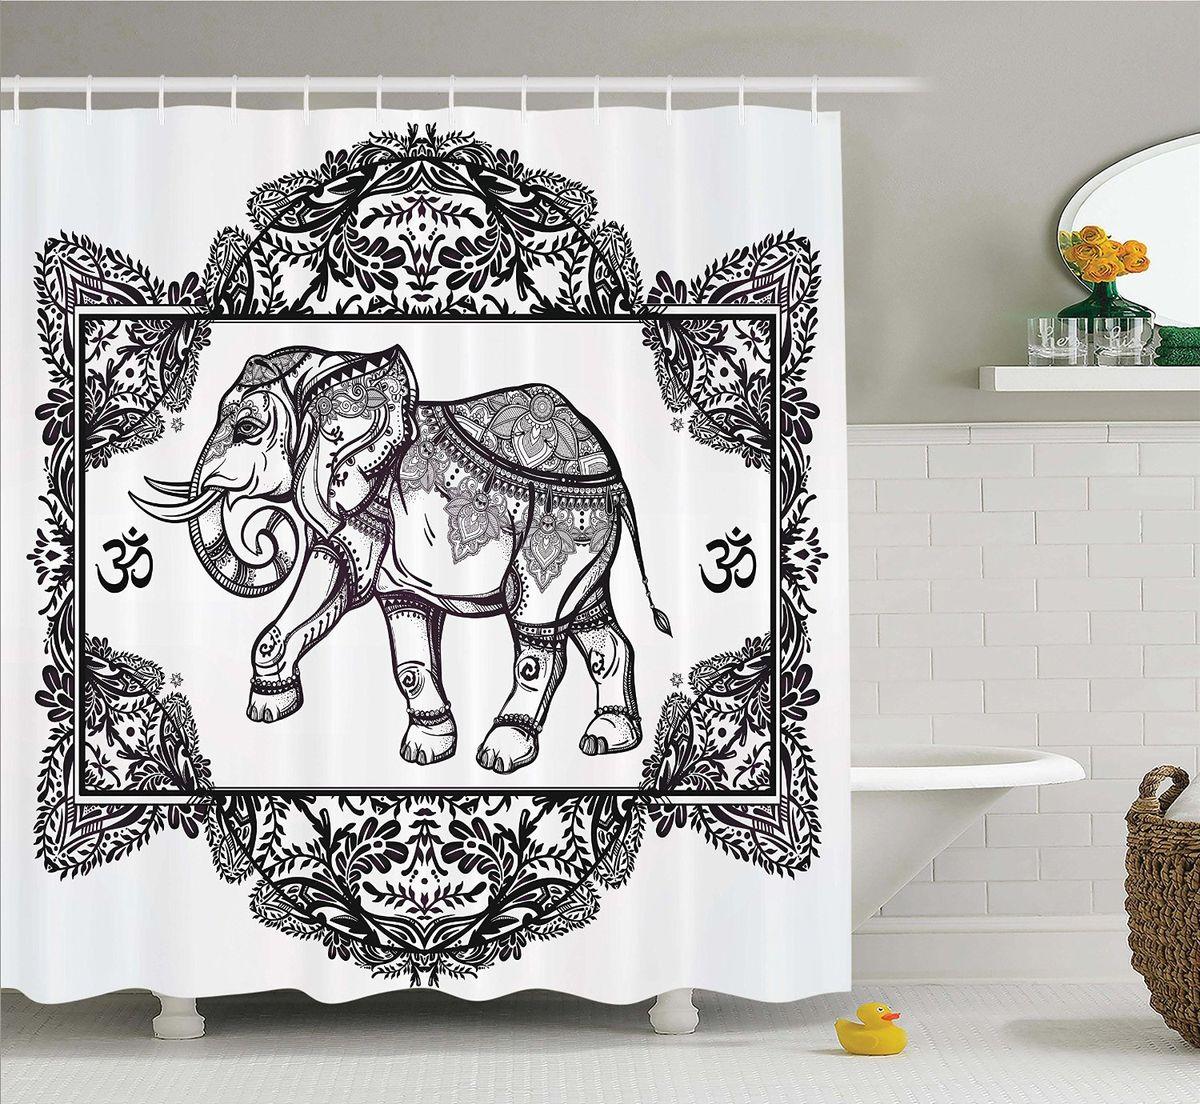 Штора для ванной комнаты Magic Lady Узорчатый слон, 180 х 200 см